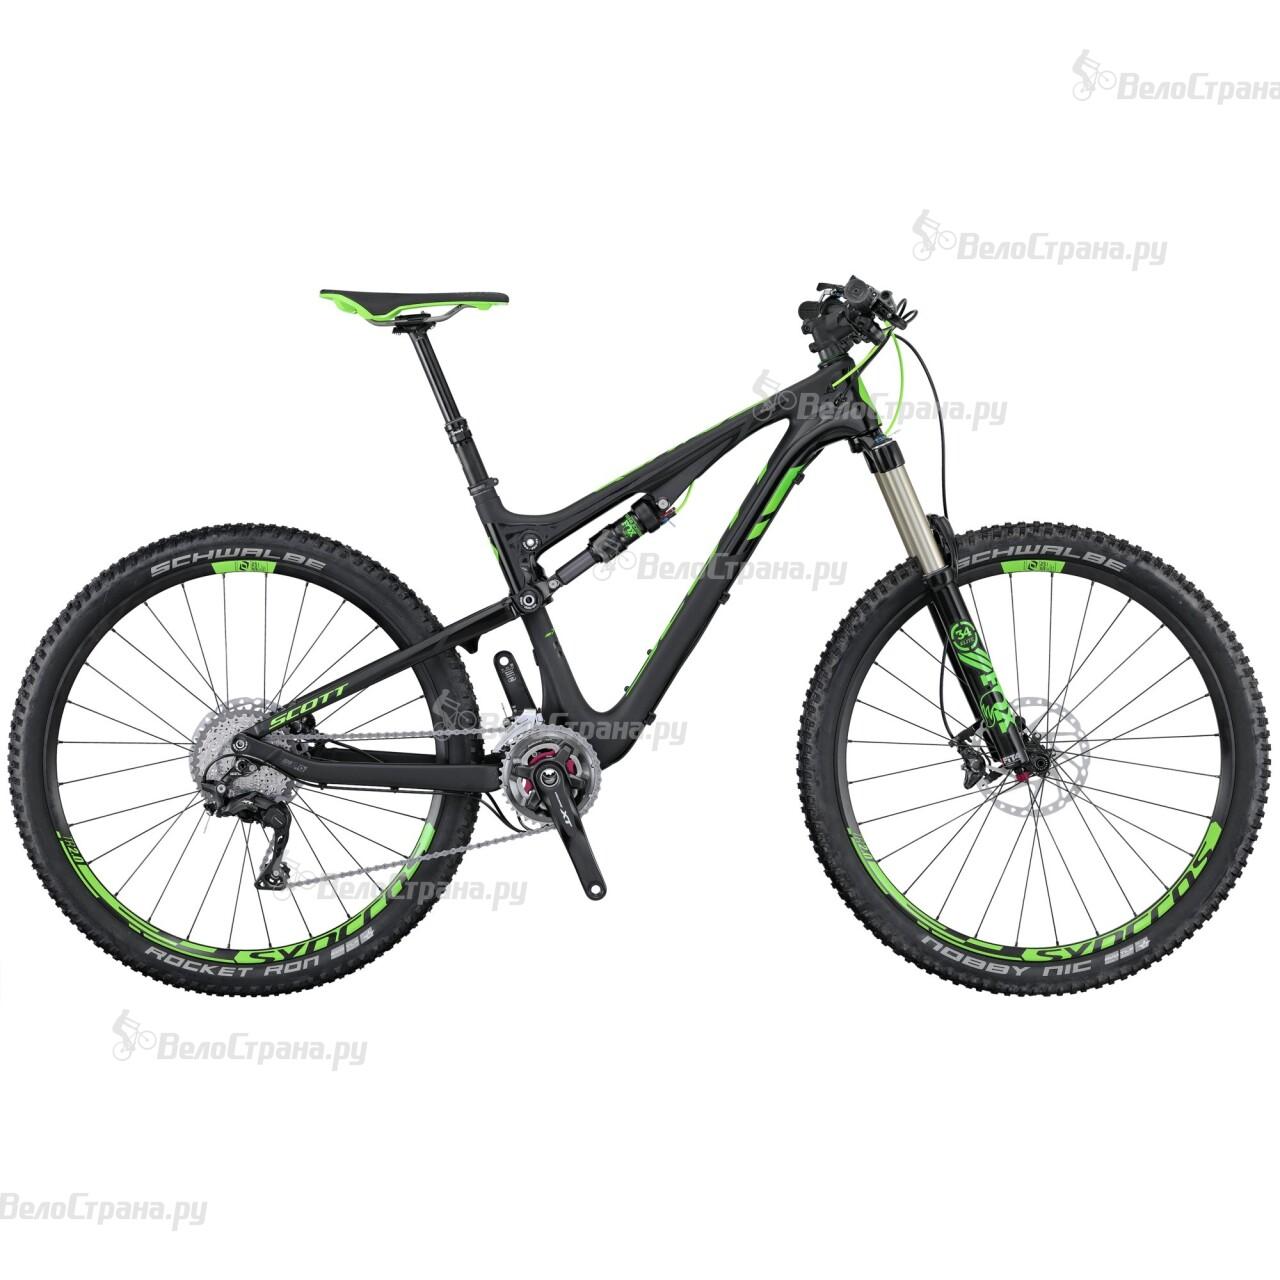 Велосипед Scott Genius 710 (2016) genius hs 300a silver